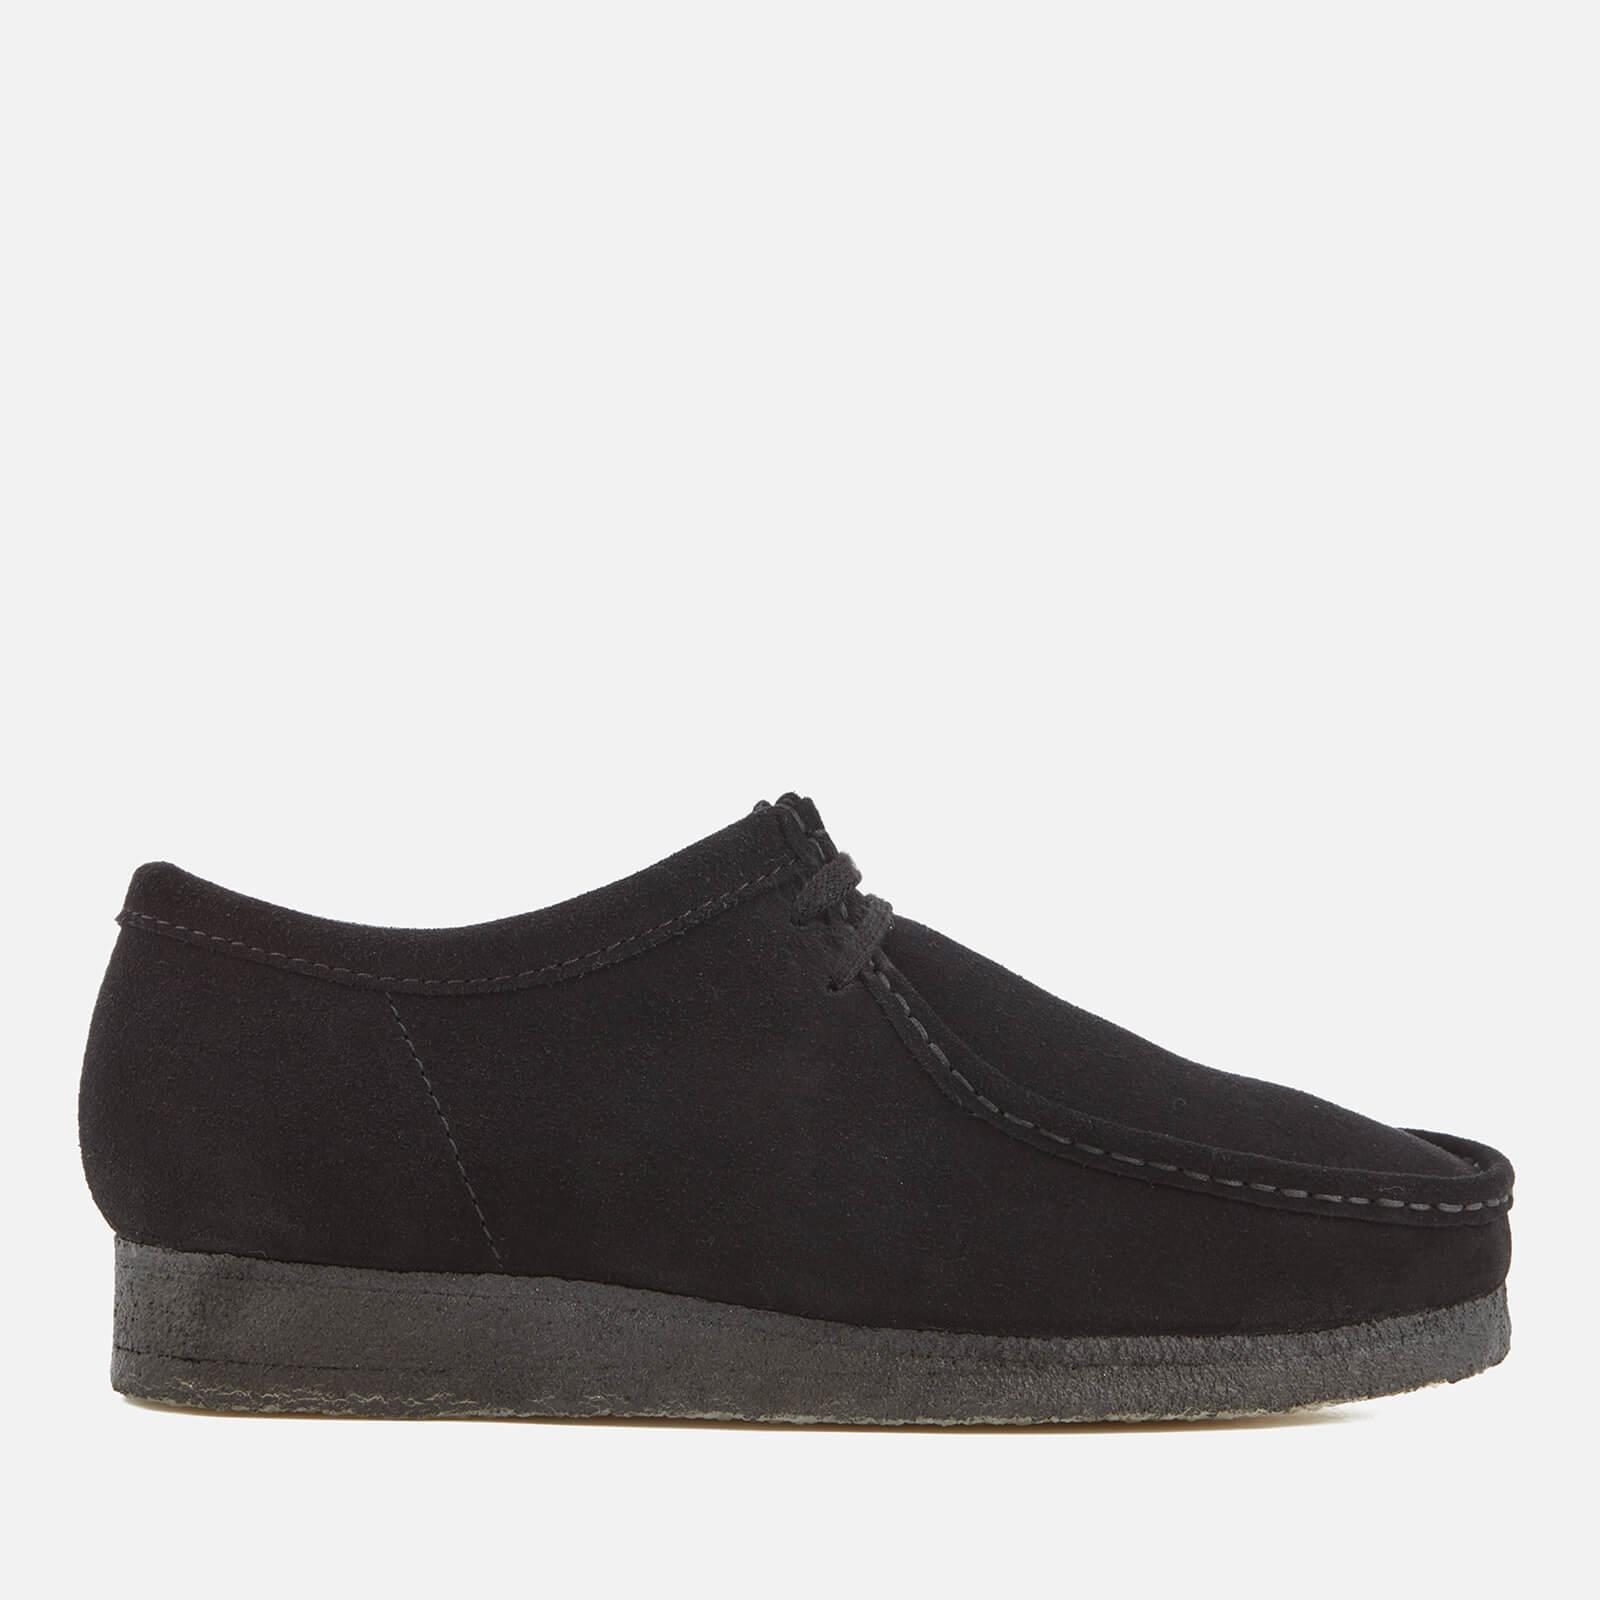 Clarks Originals Men's Wallabee Suede Shoes - Black - UK 8 - Black